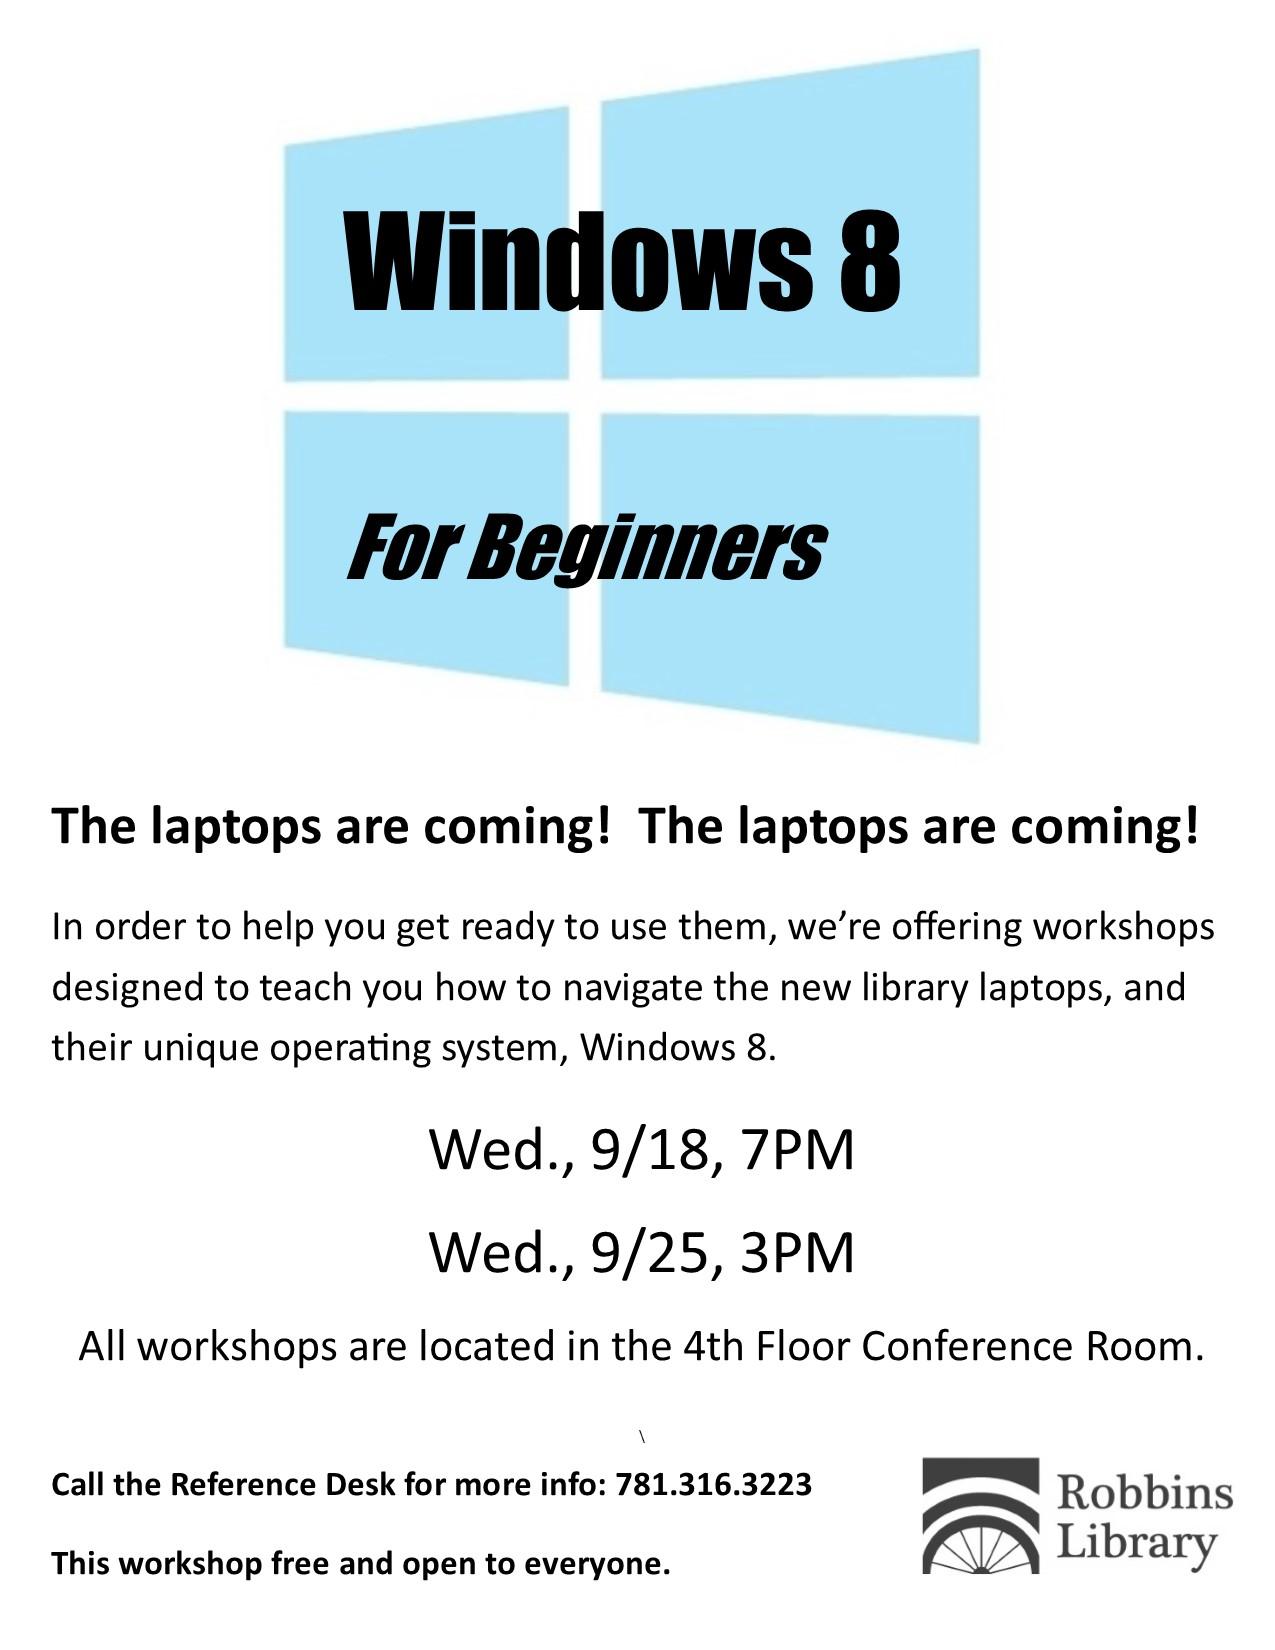 windows 8 workshops   robbins library blog